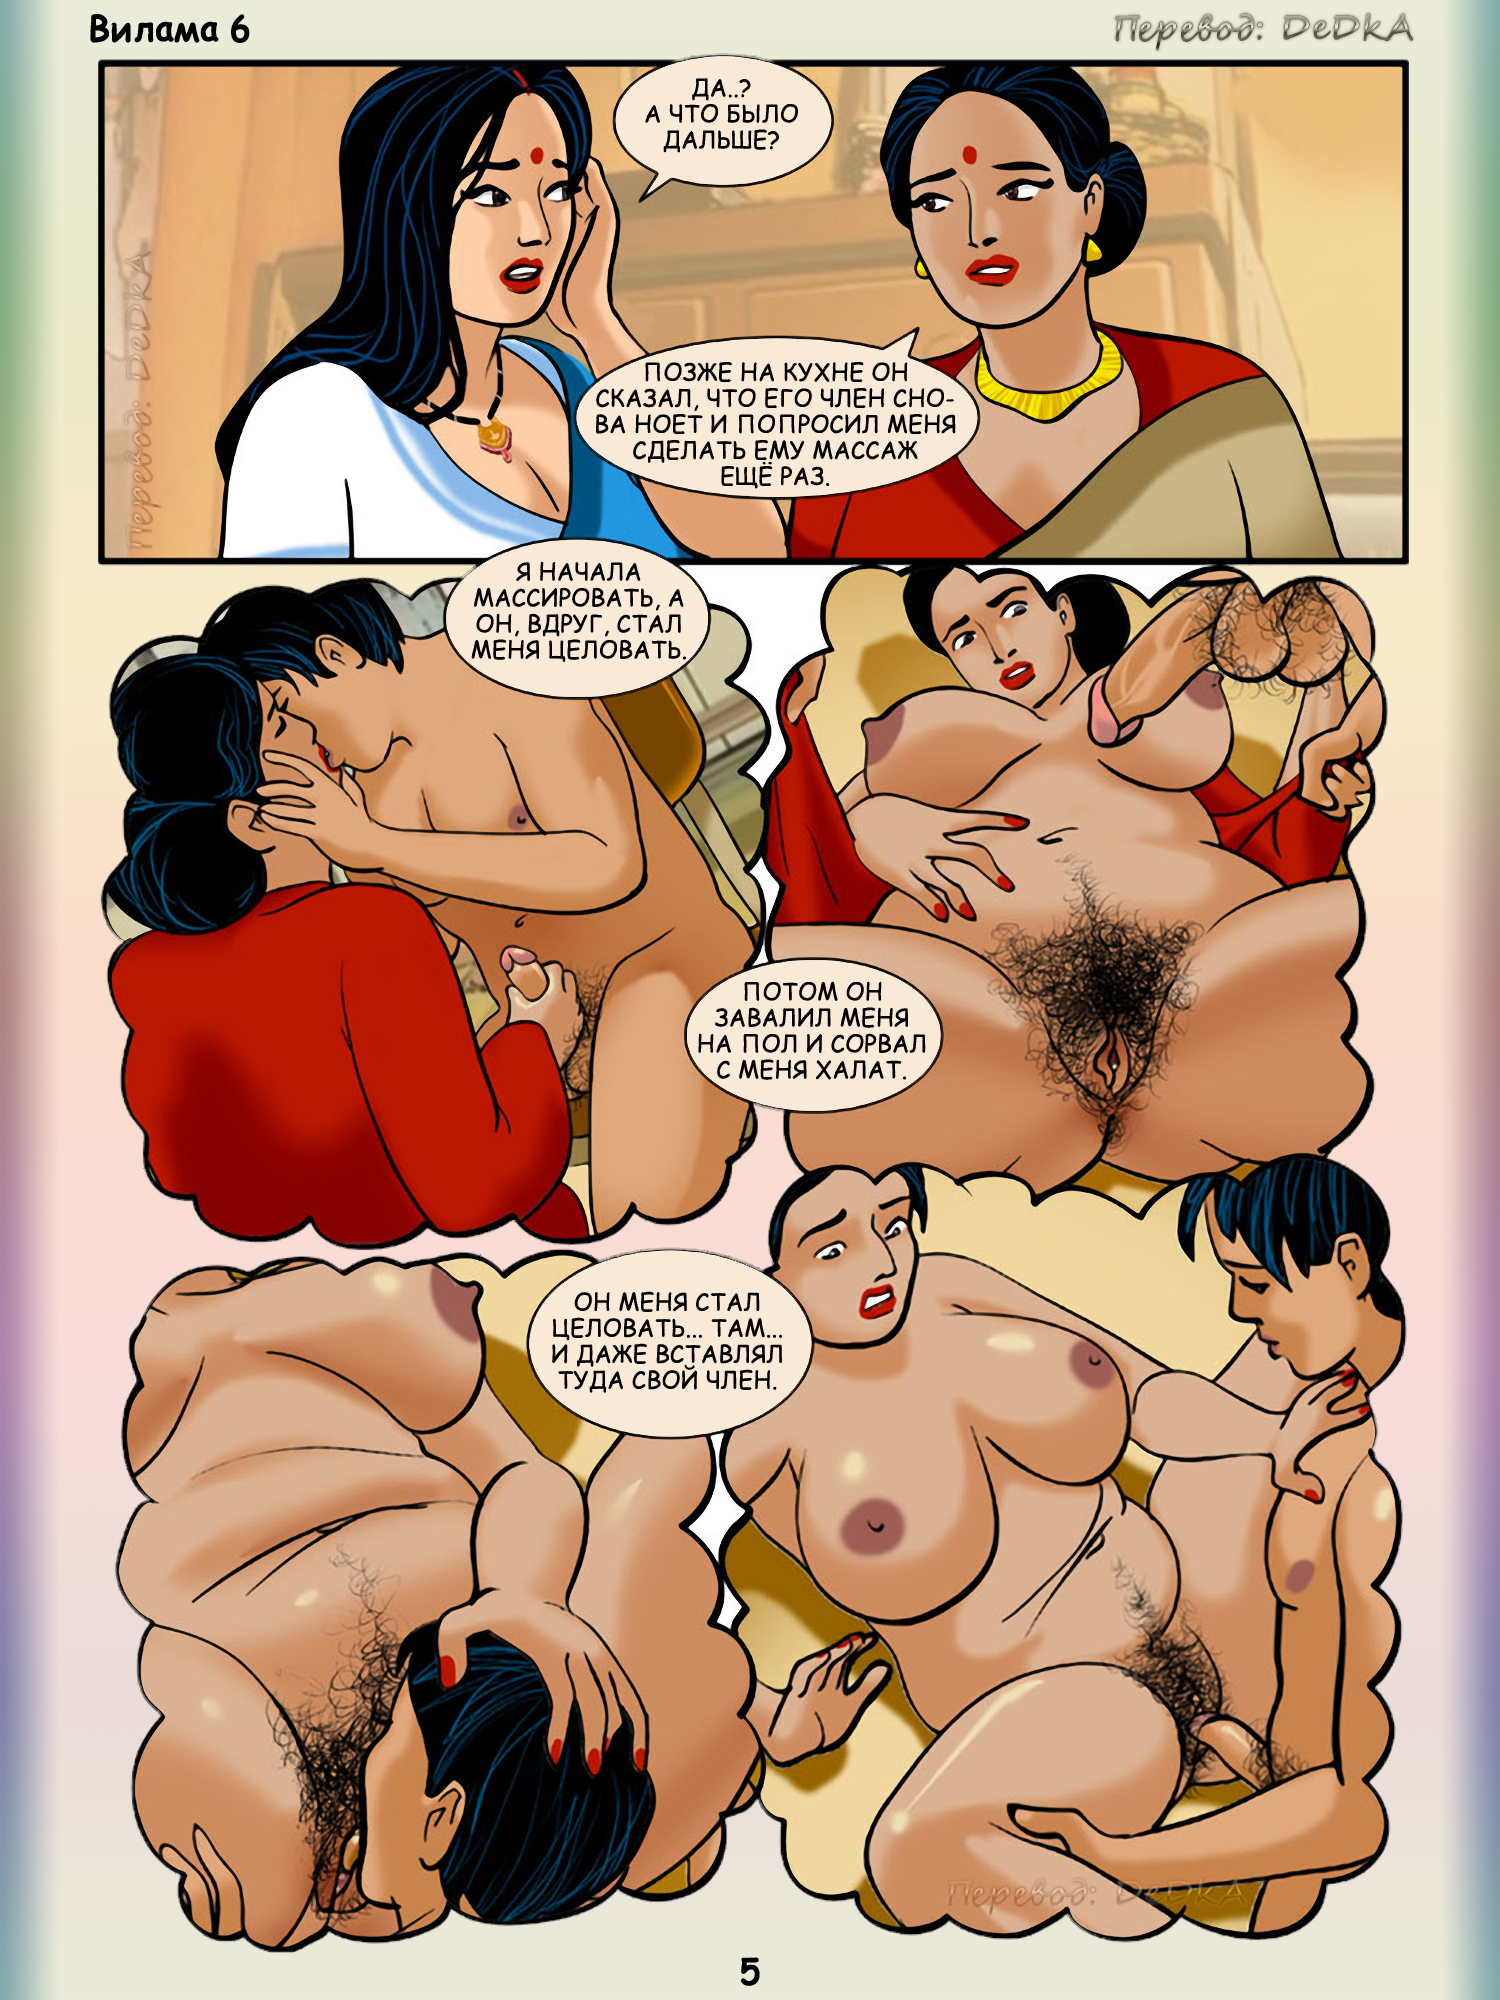 Секс с диалогами 17 фотография